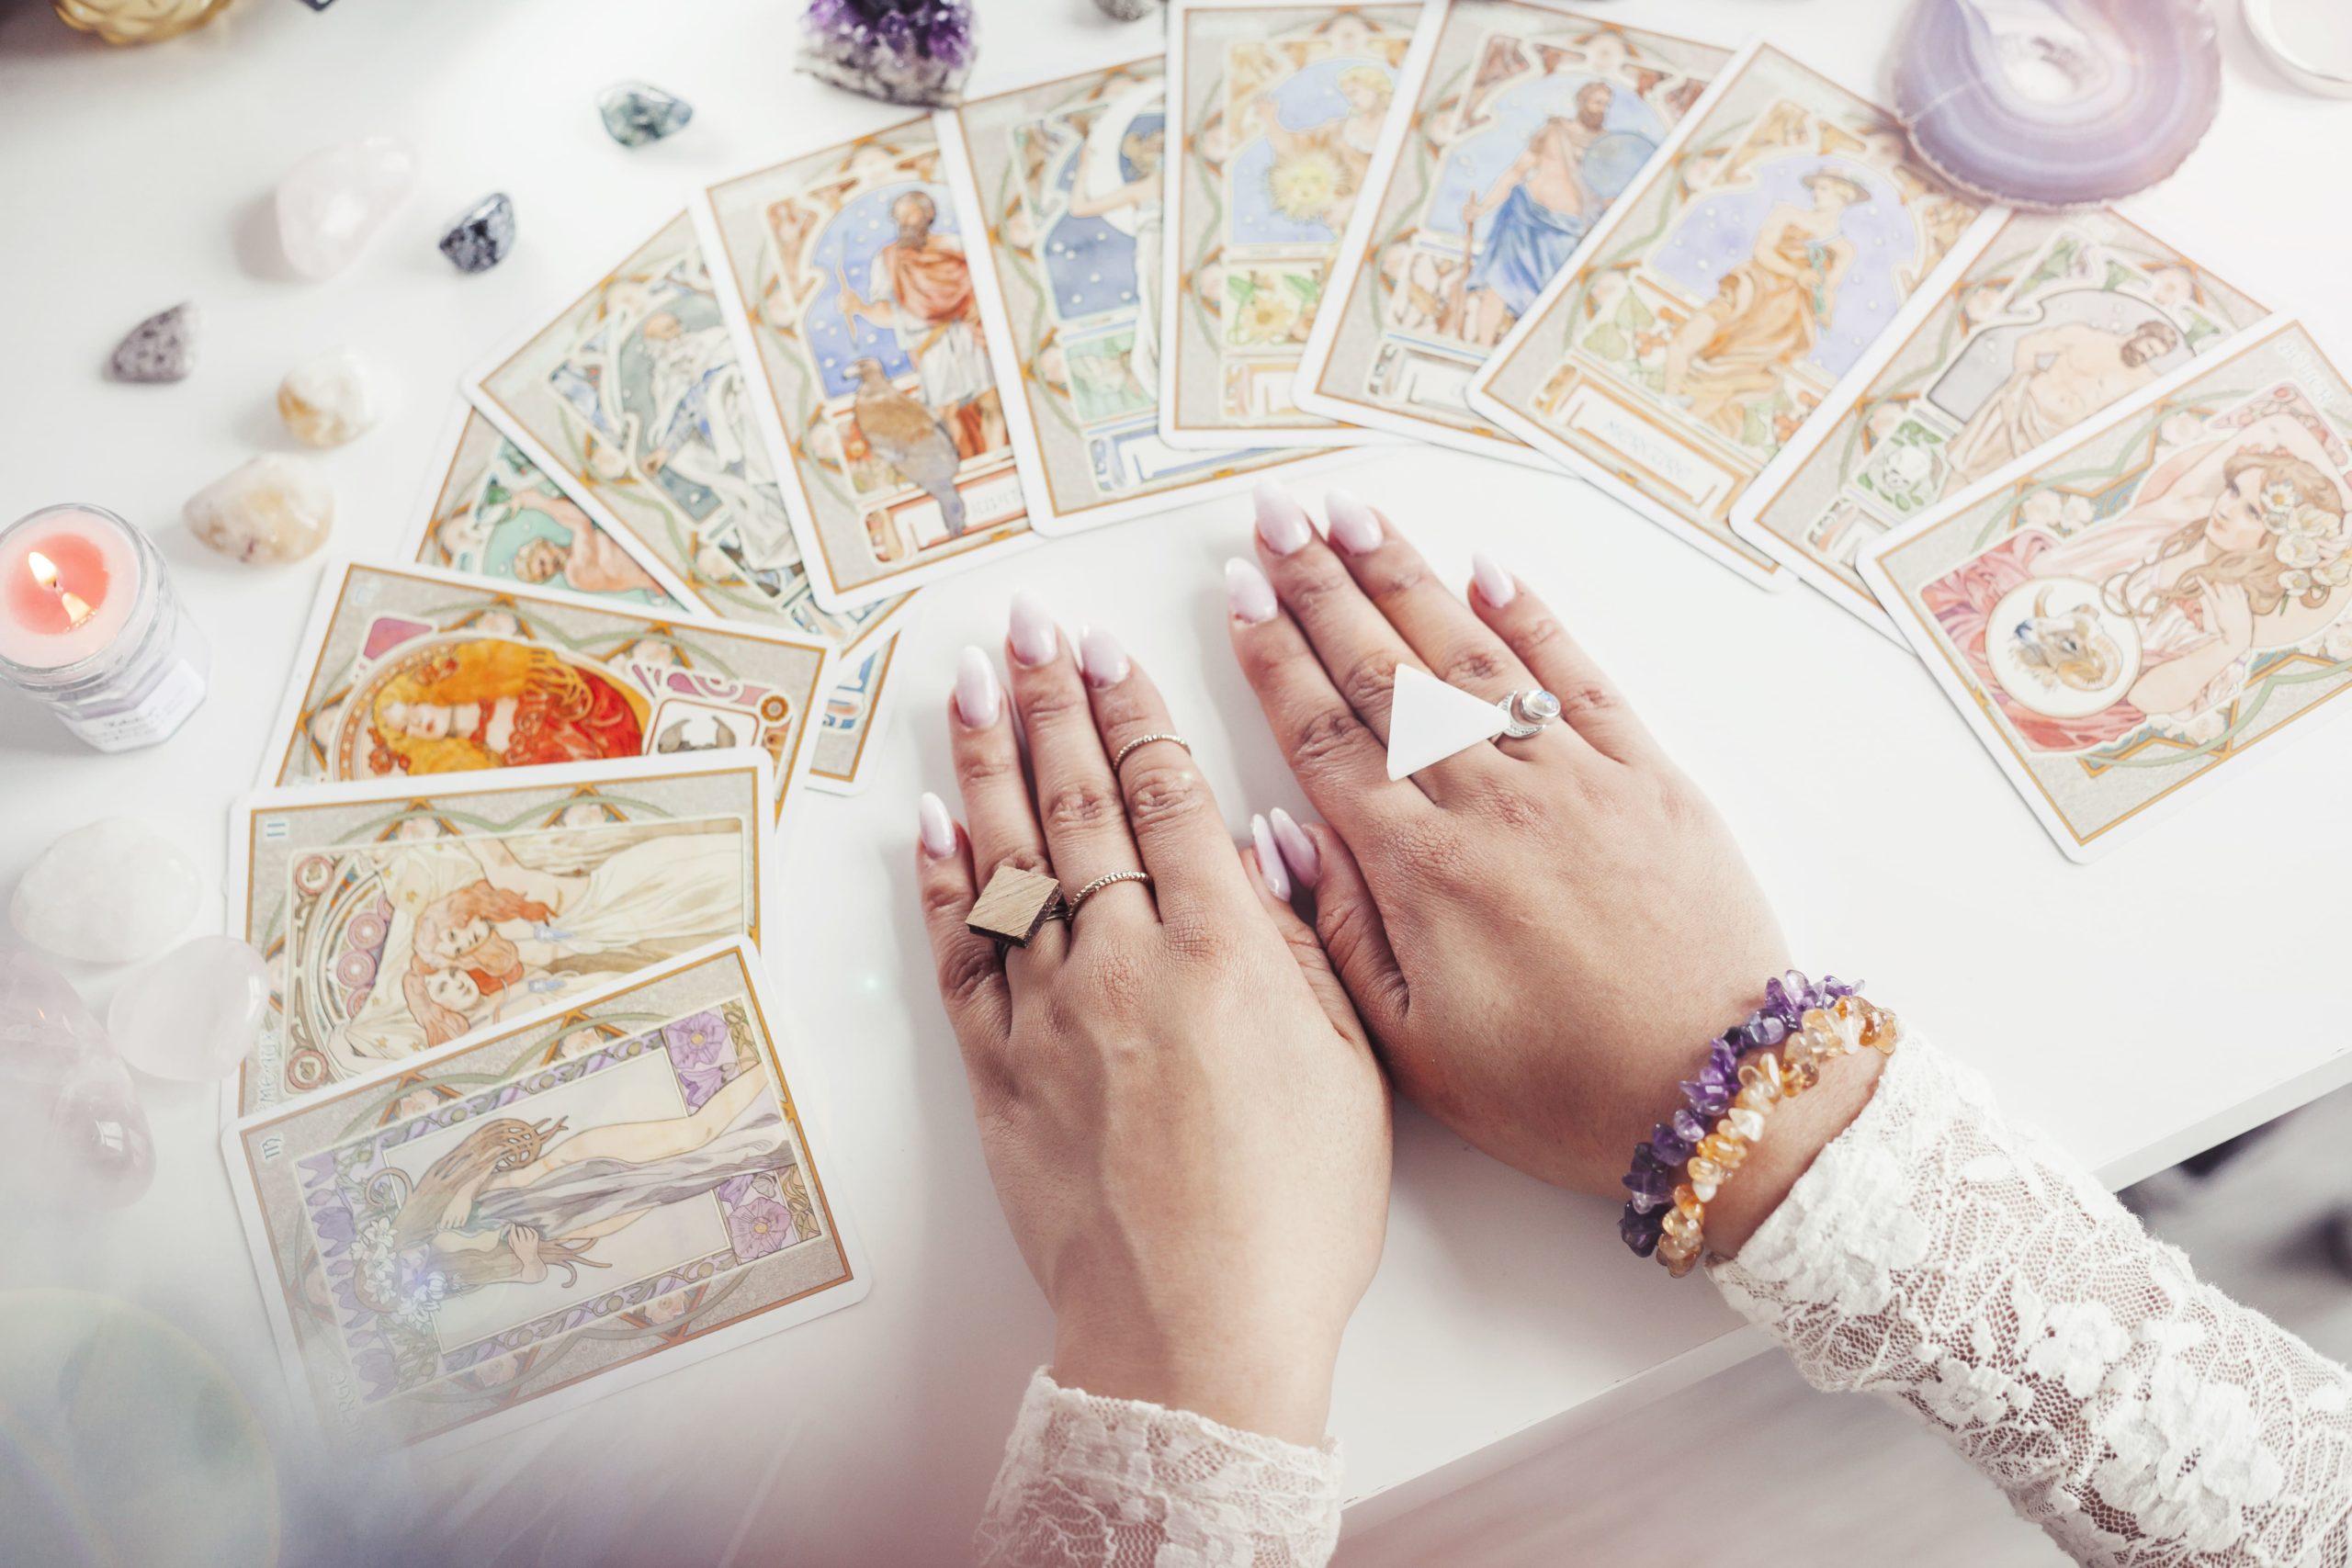 Les décans en astrologie | Astrolya